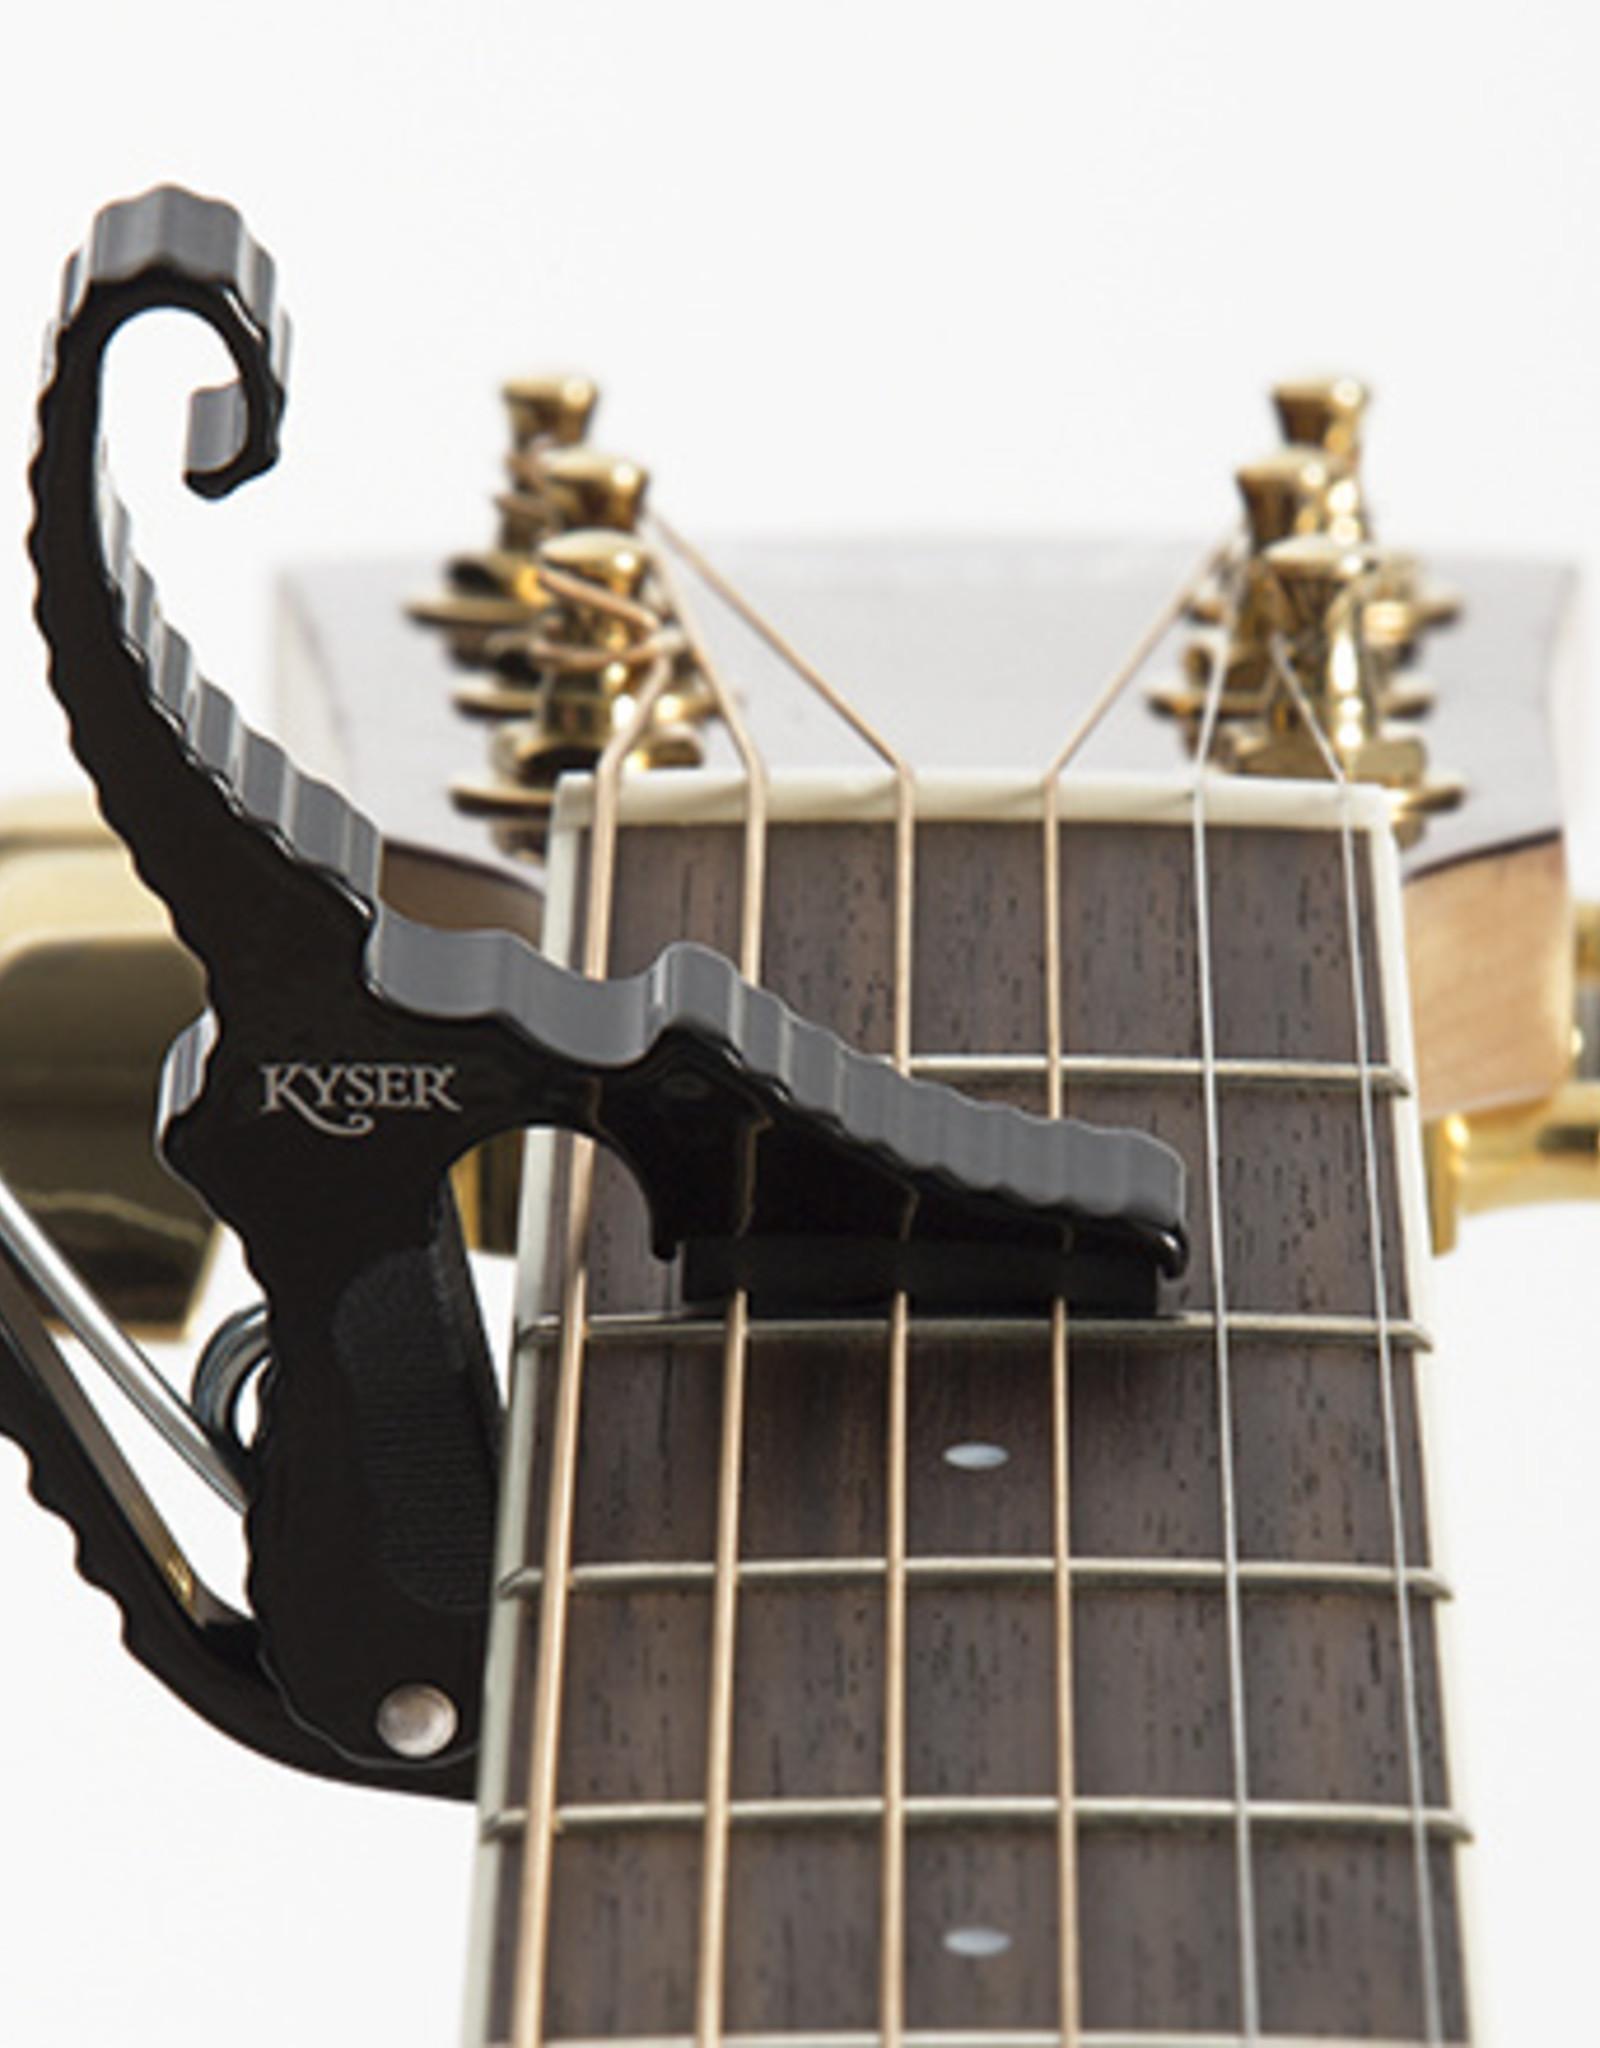 Kyser KYSER QUICK CHANGE GUITAR CAPO SHORT CUT